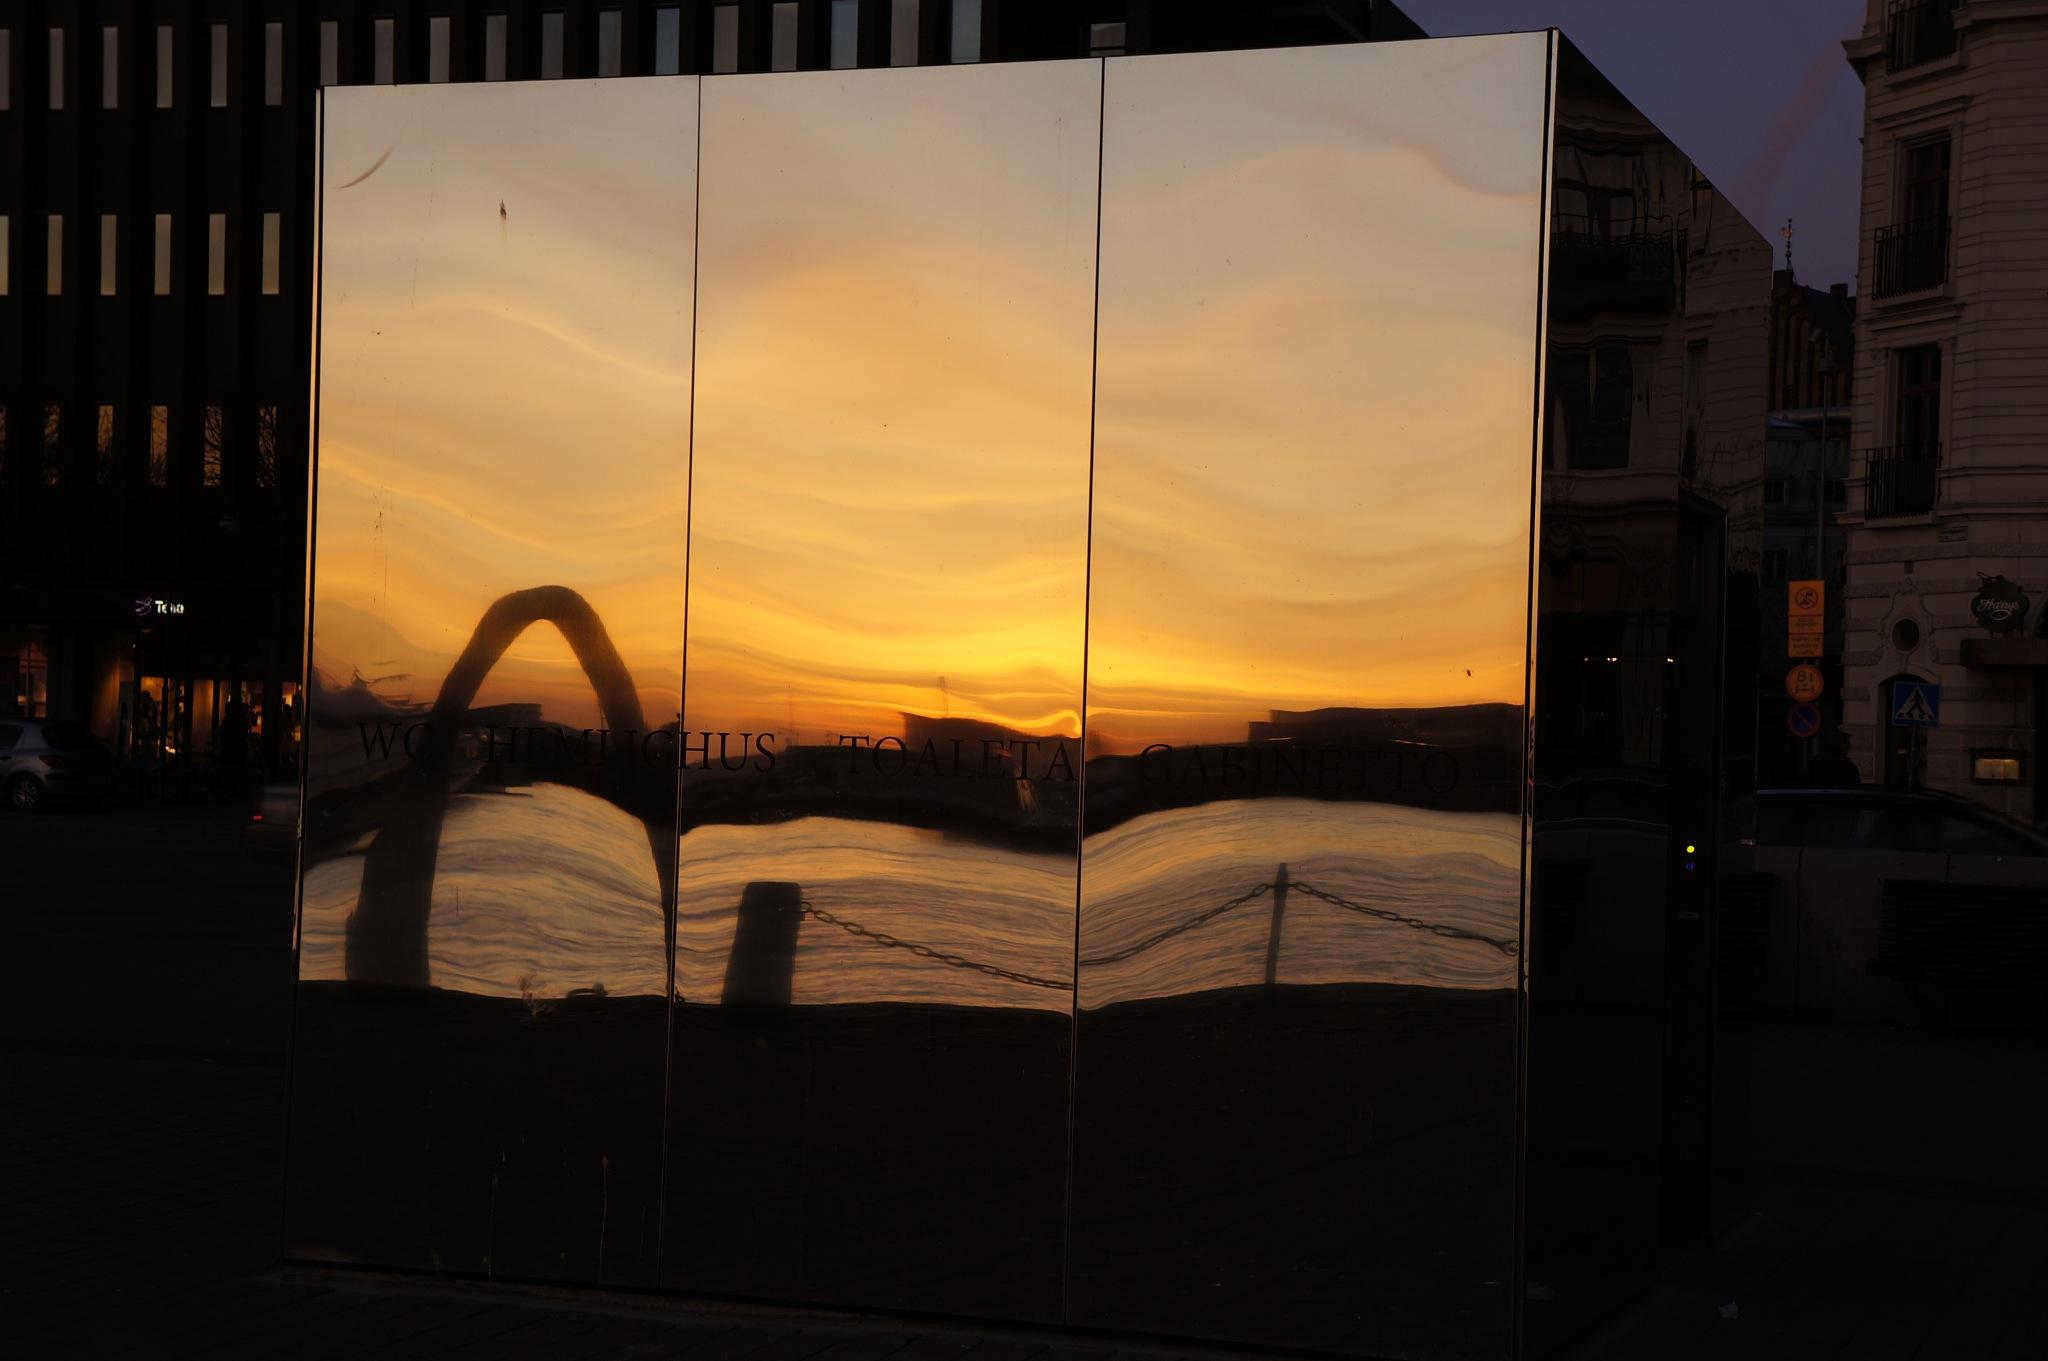 mirroring the sunset by Max Cesare Parodi